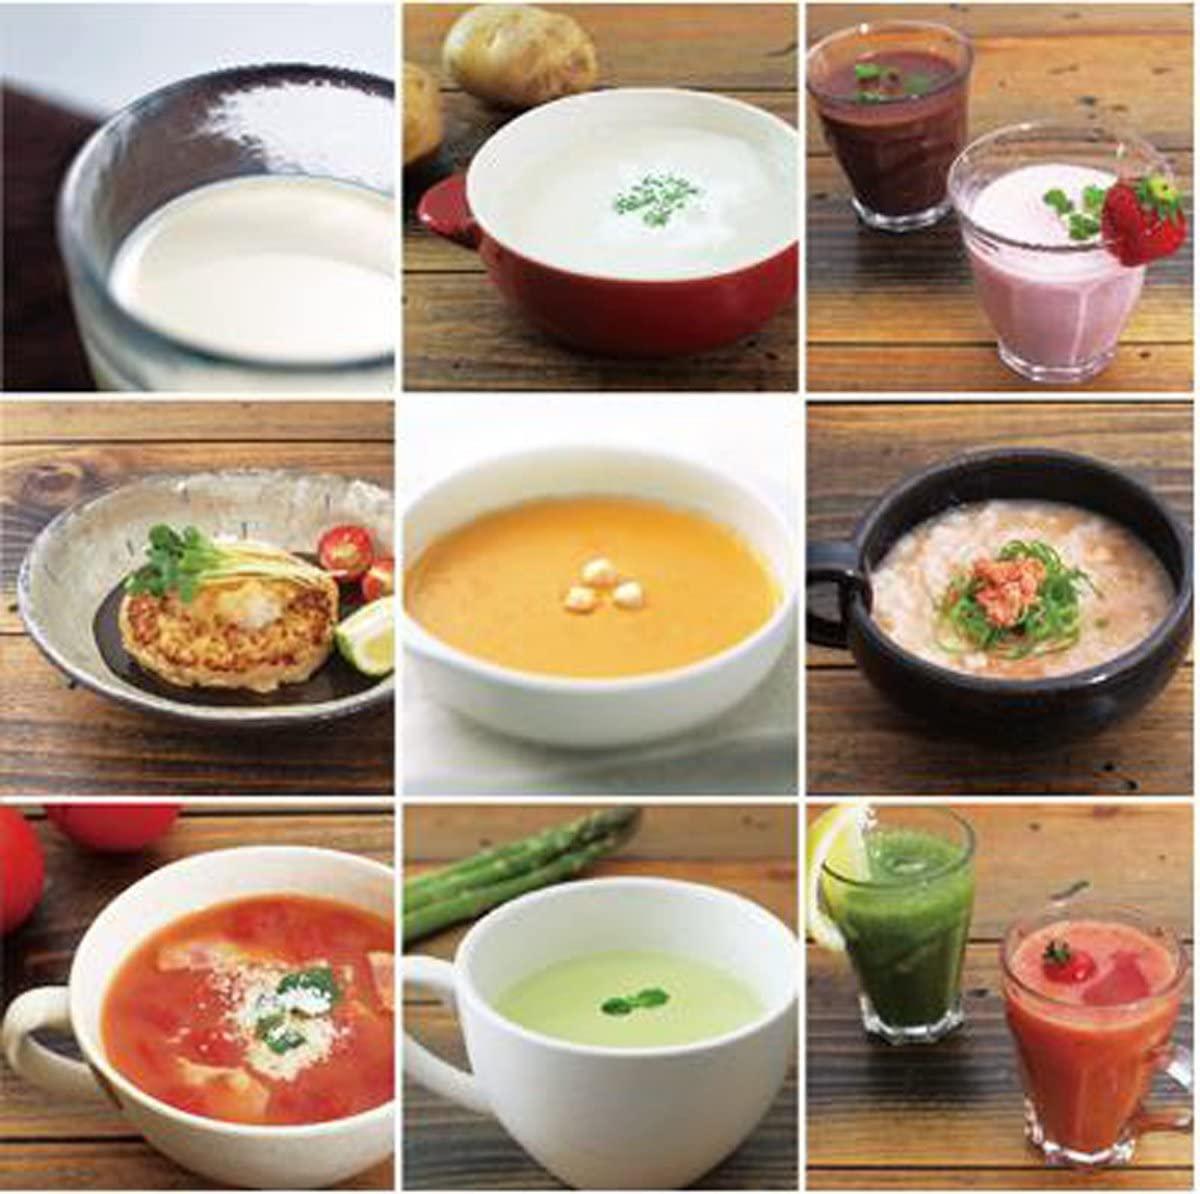 APIX(アピックス) 豆乳&スープメーカー ASM-294の商品画像14